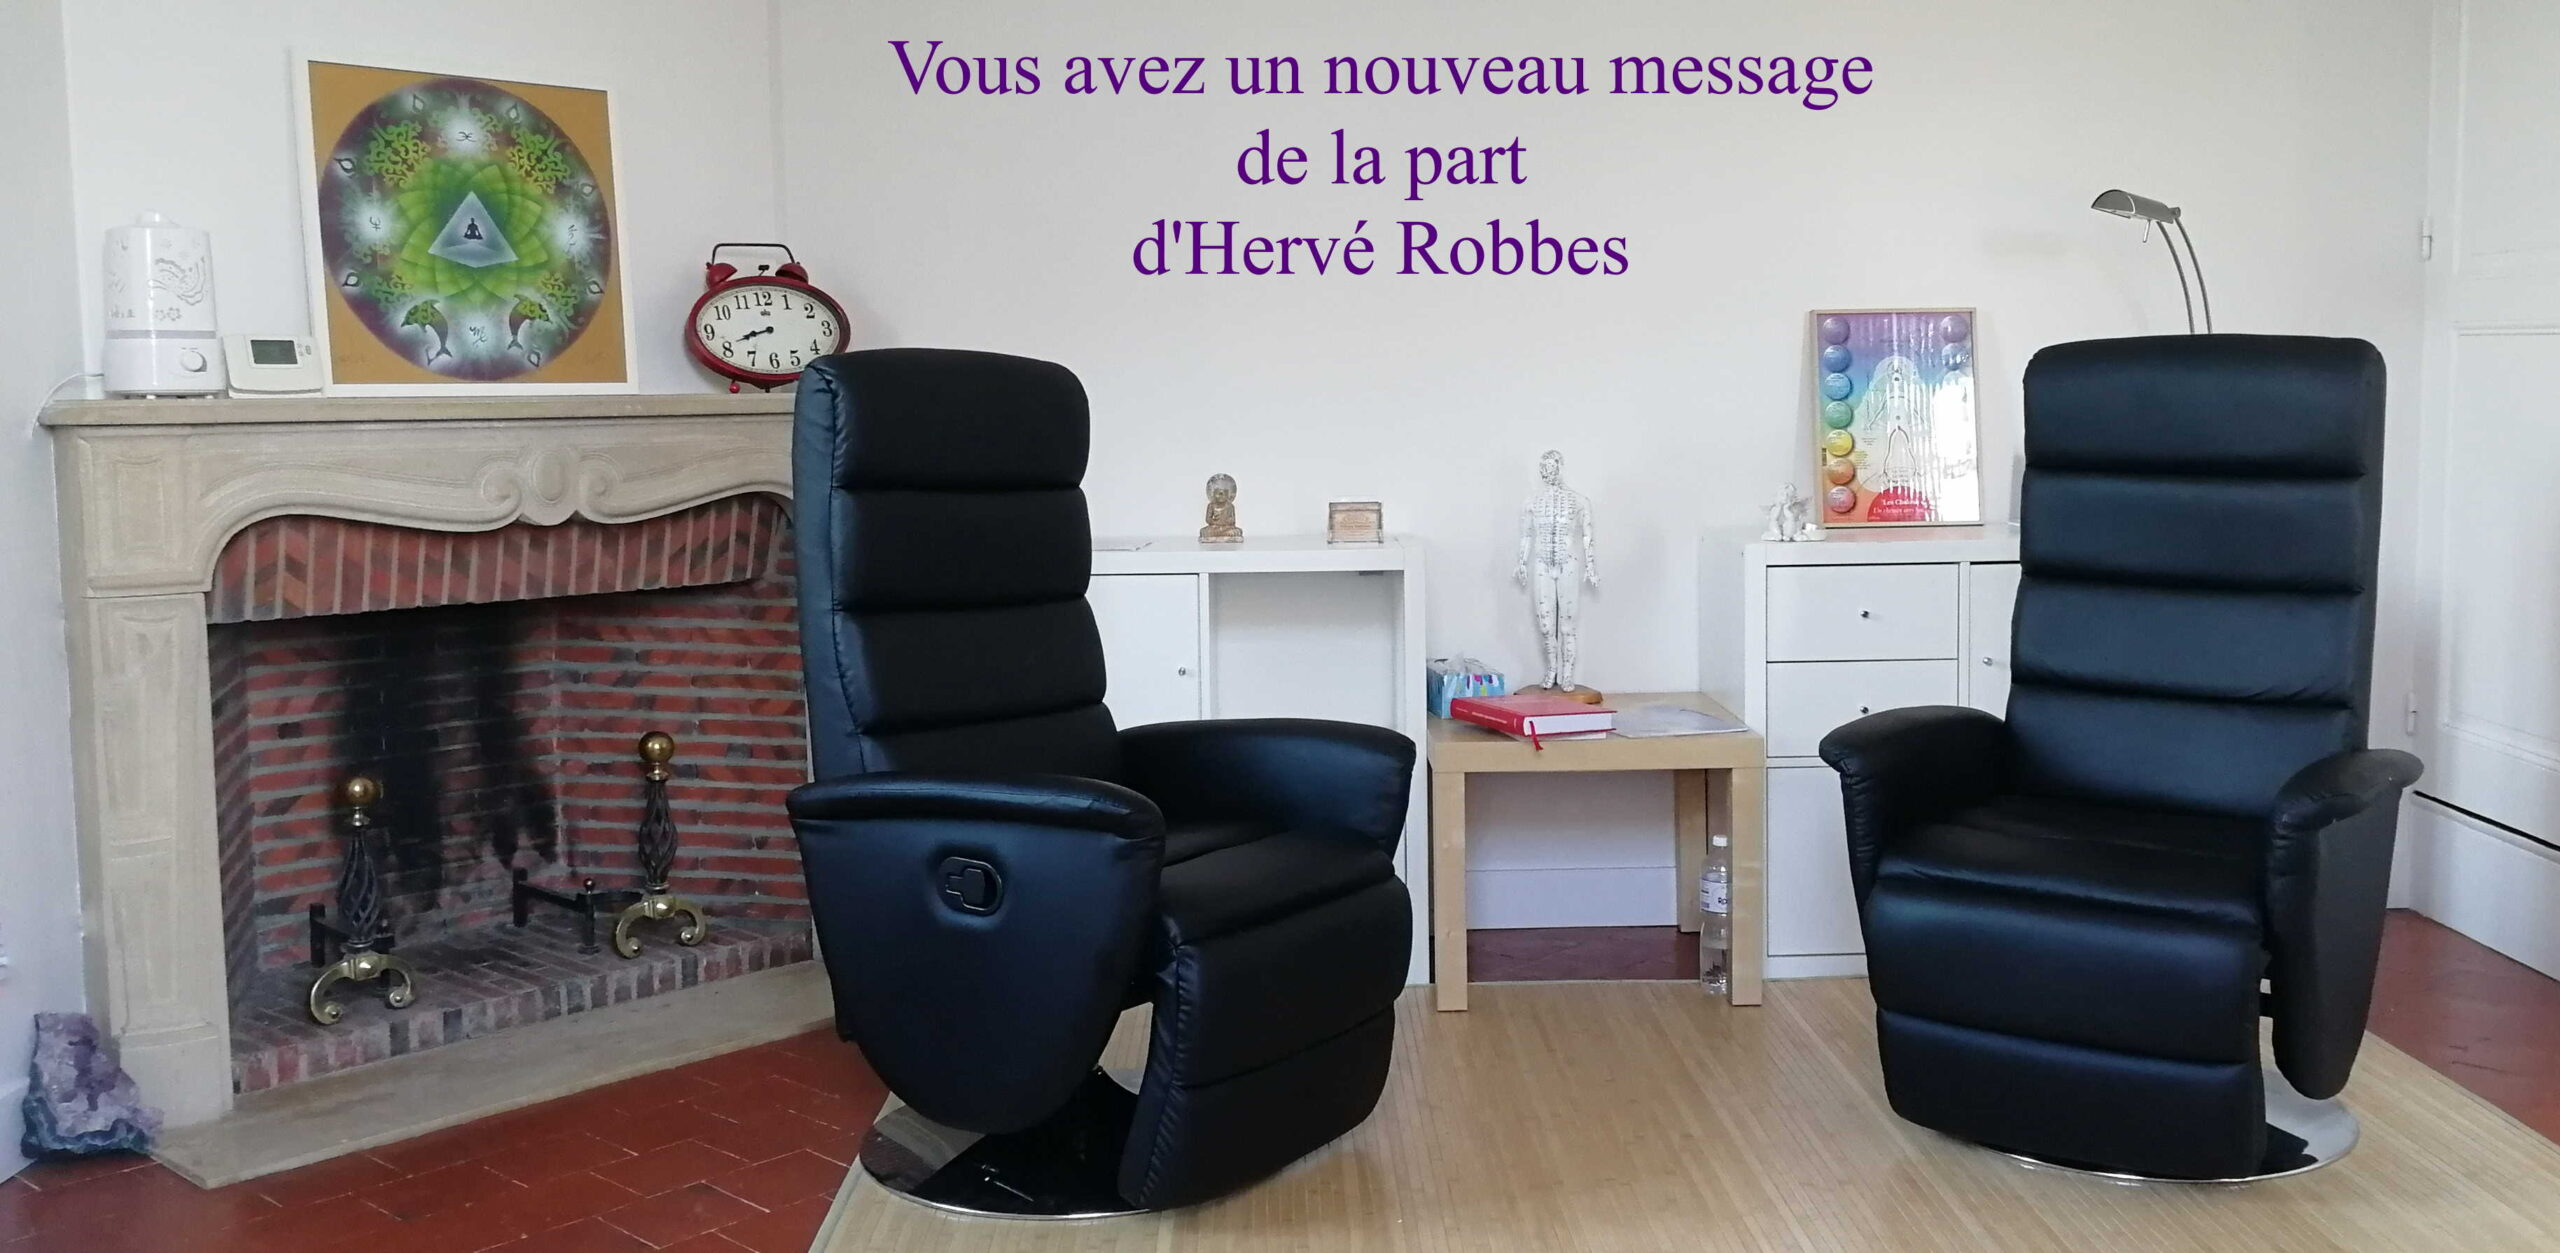 Une image d'Hervé Robbes